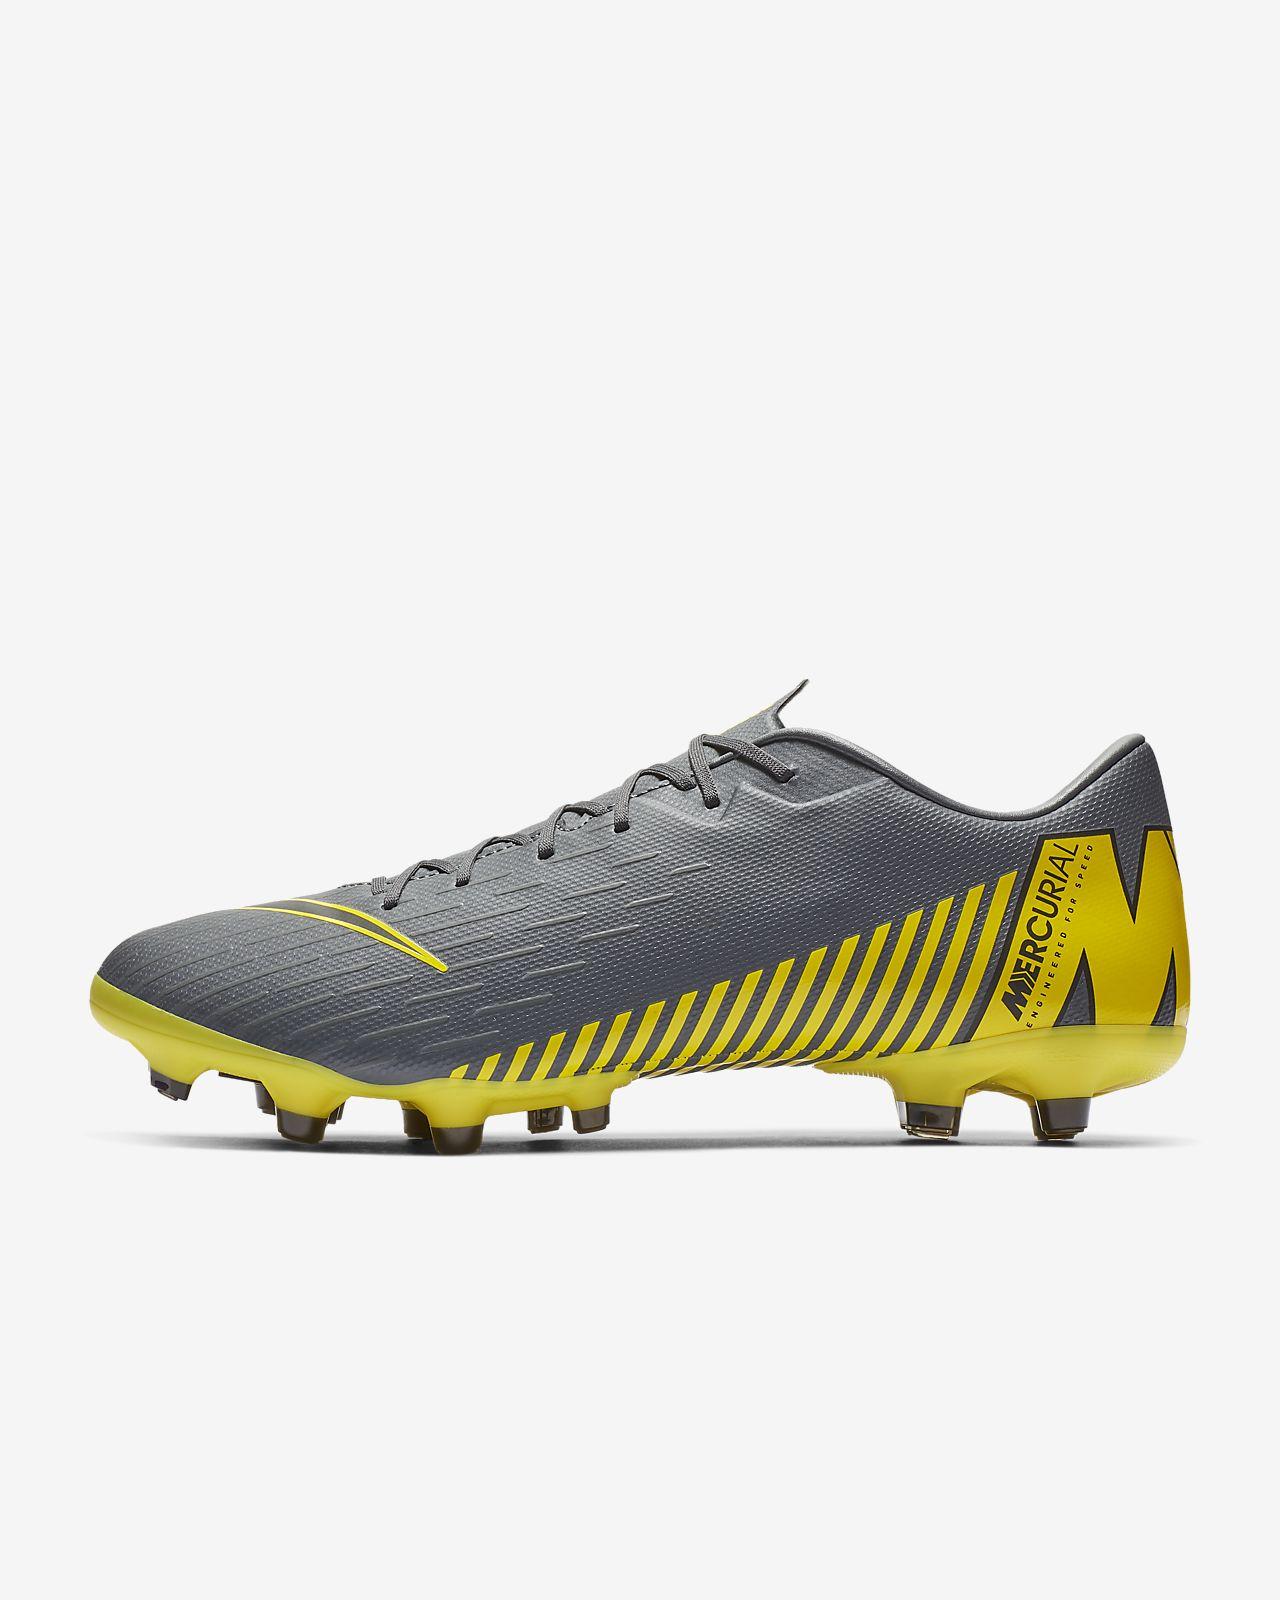 6dd0f8cc011 Nike Vapor 12 Academy MG Multi-Ground Football Boot. Nike.com GB